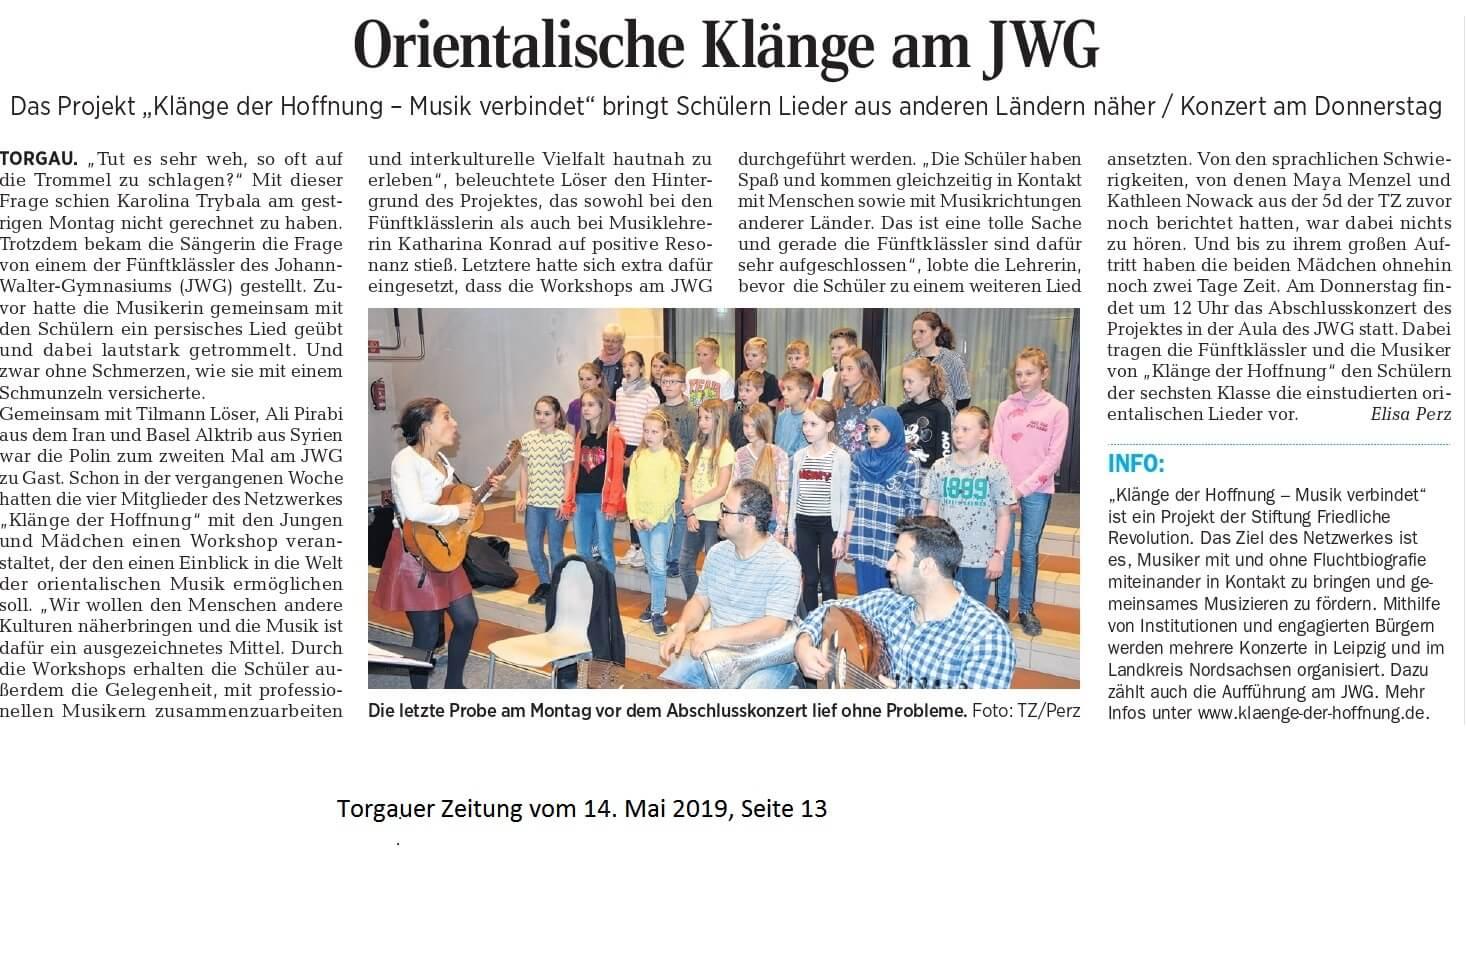 14_05_Torgauer Zeitung S. 13_Ausschnitt